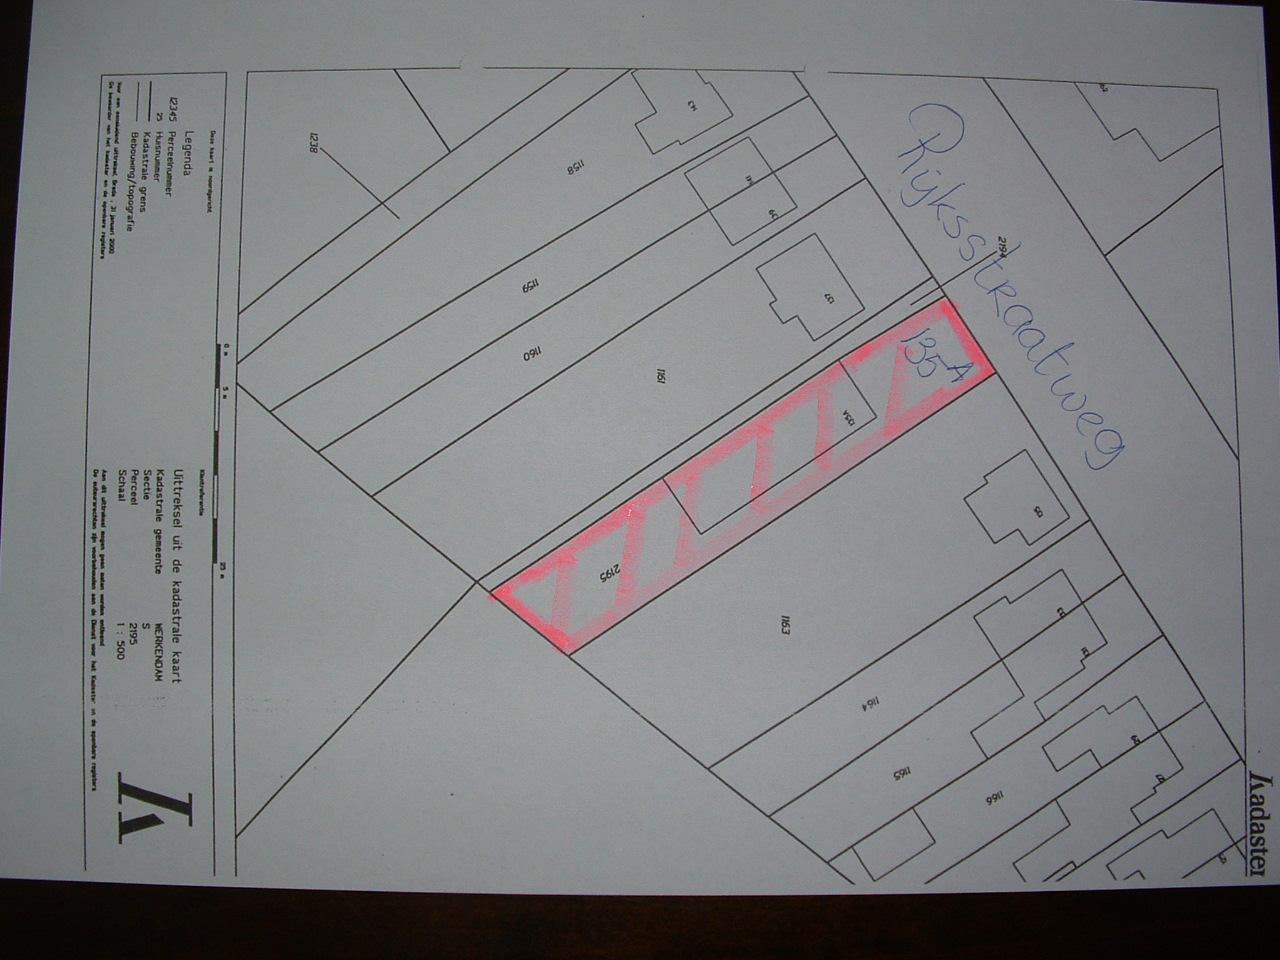 Bedrijfsruimte Sleeuwijk Rijksstraatweg 135a